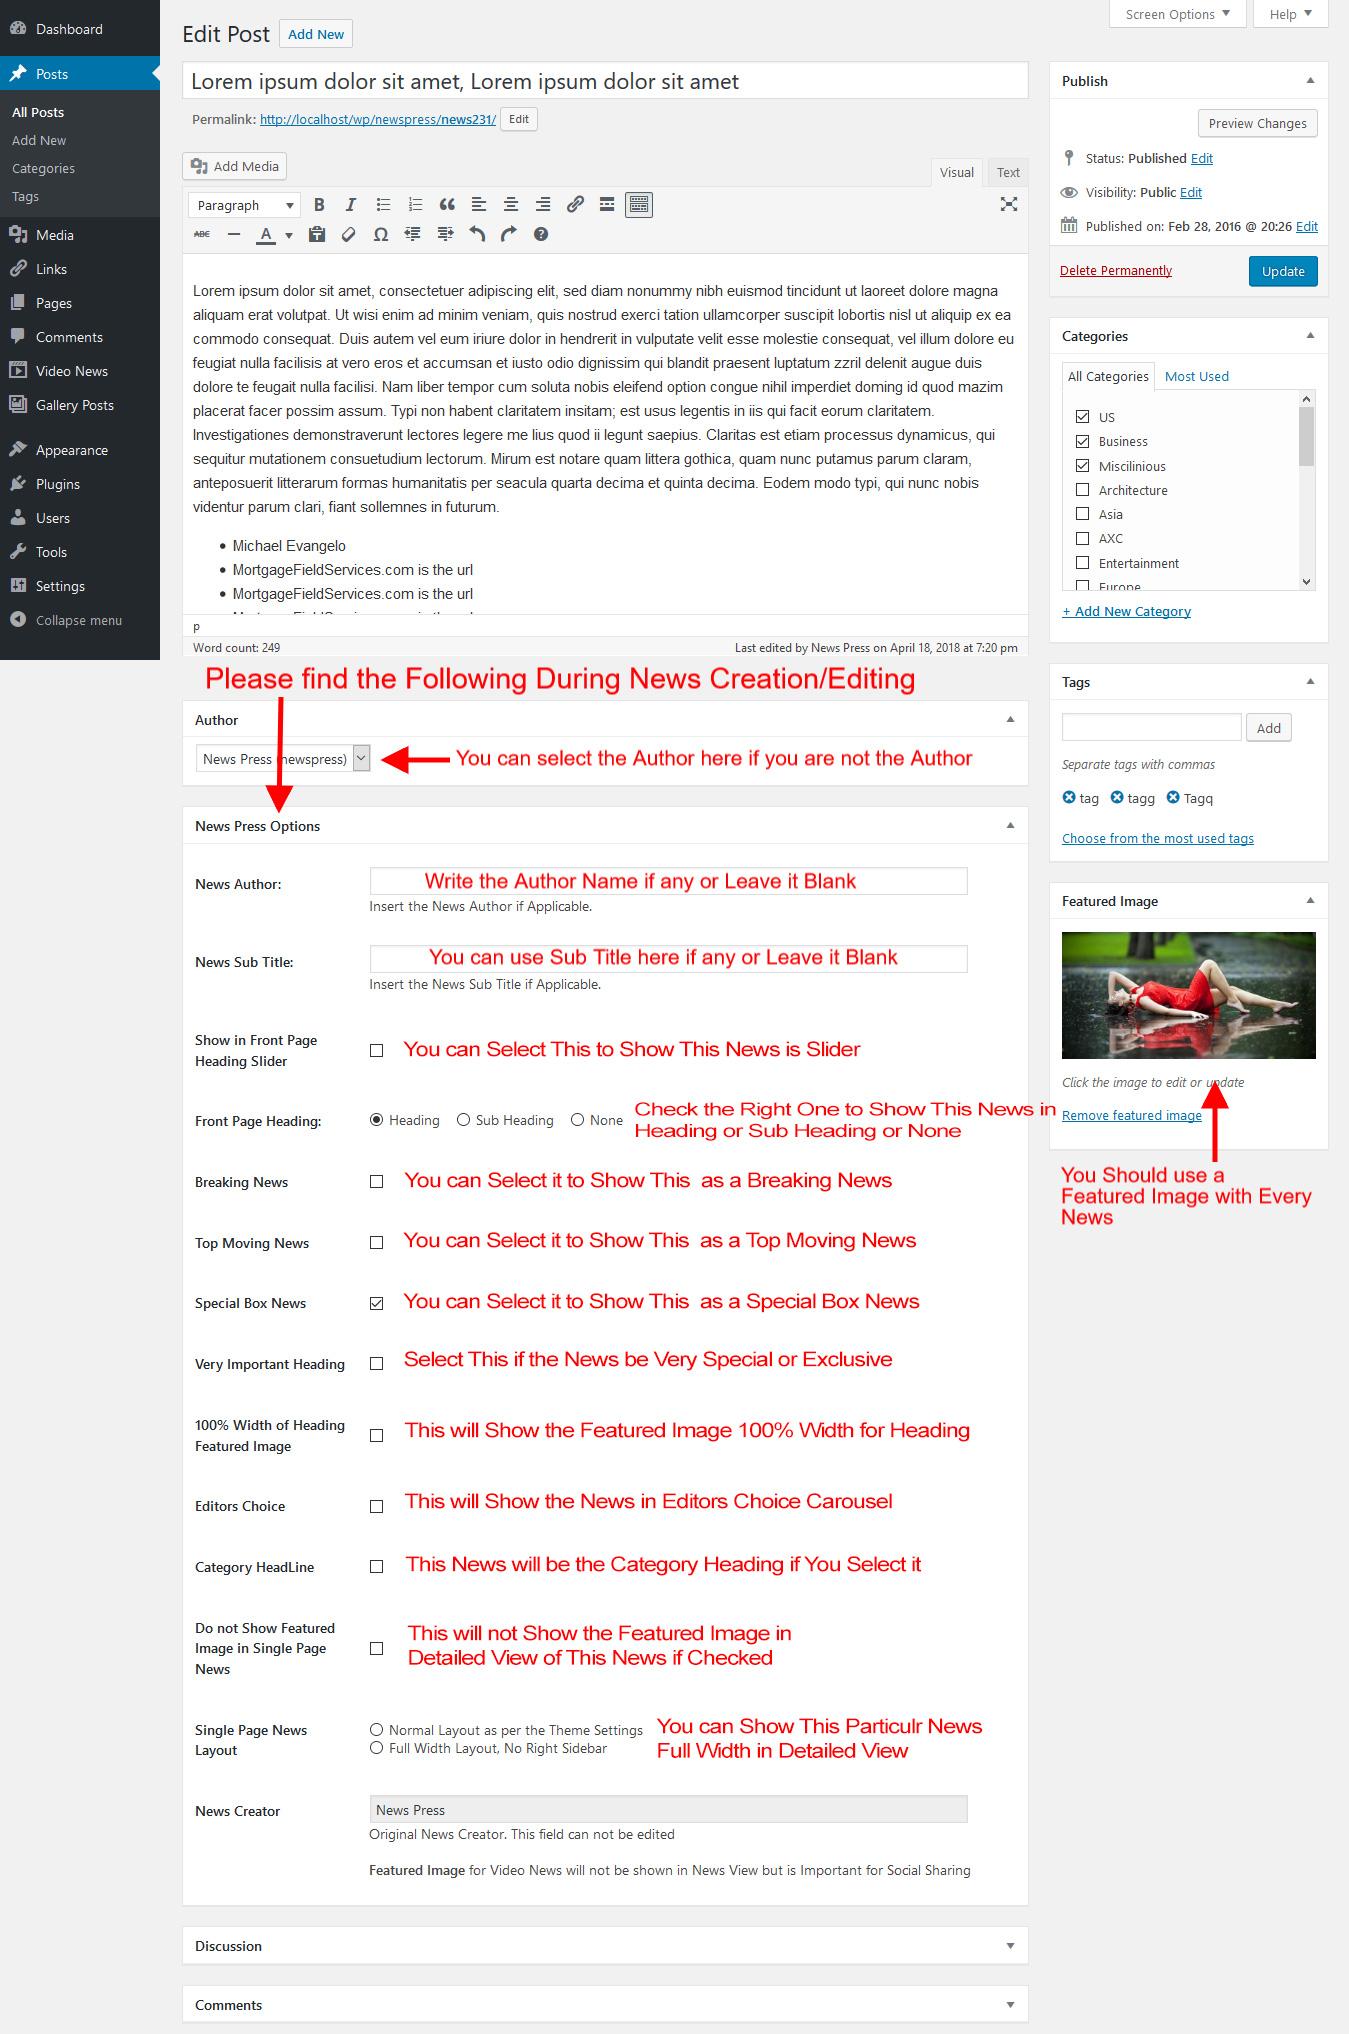 NewsPress Post/News Options